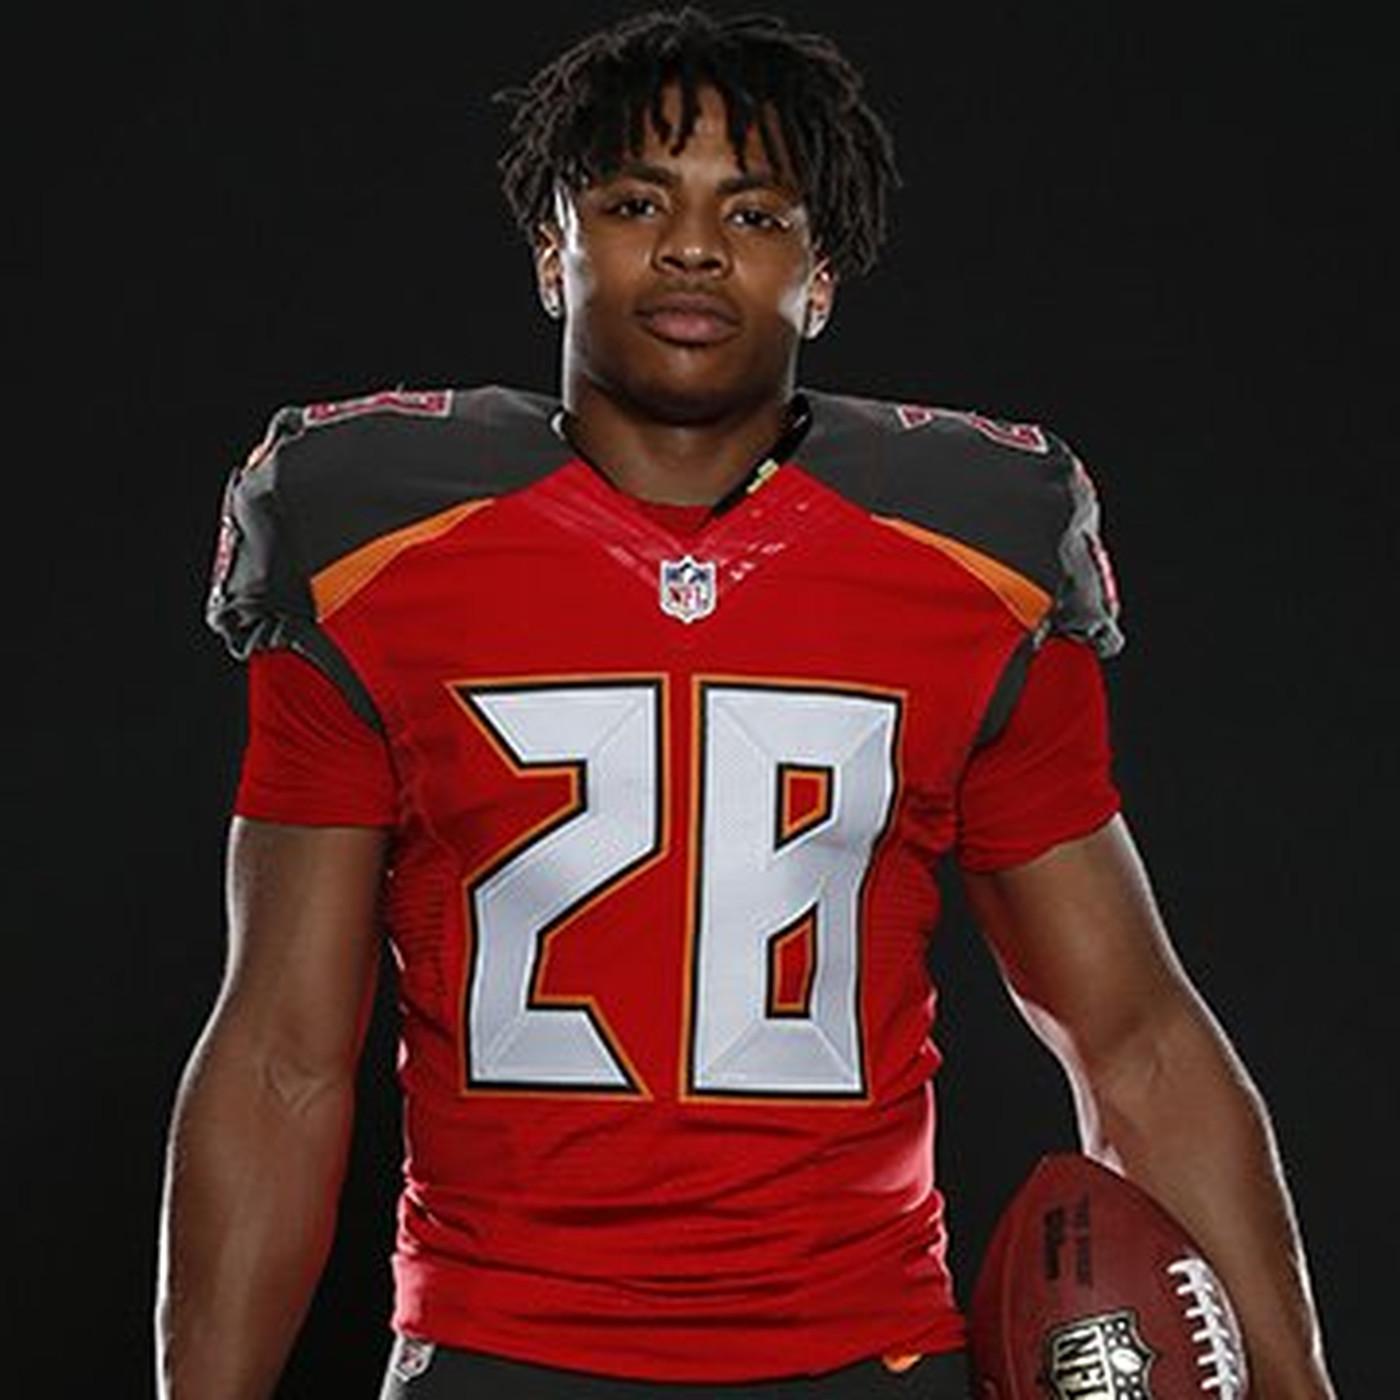 NFL Draft 2016: Buccaneers announce rookie jersey numbers - Bucs ...